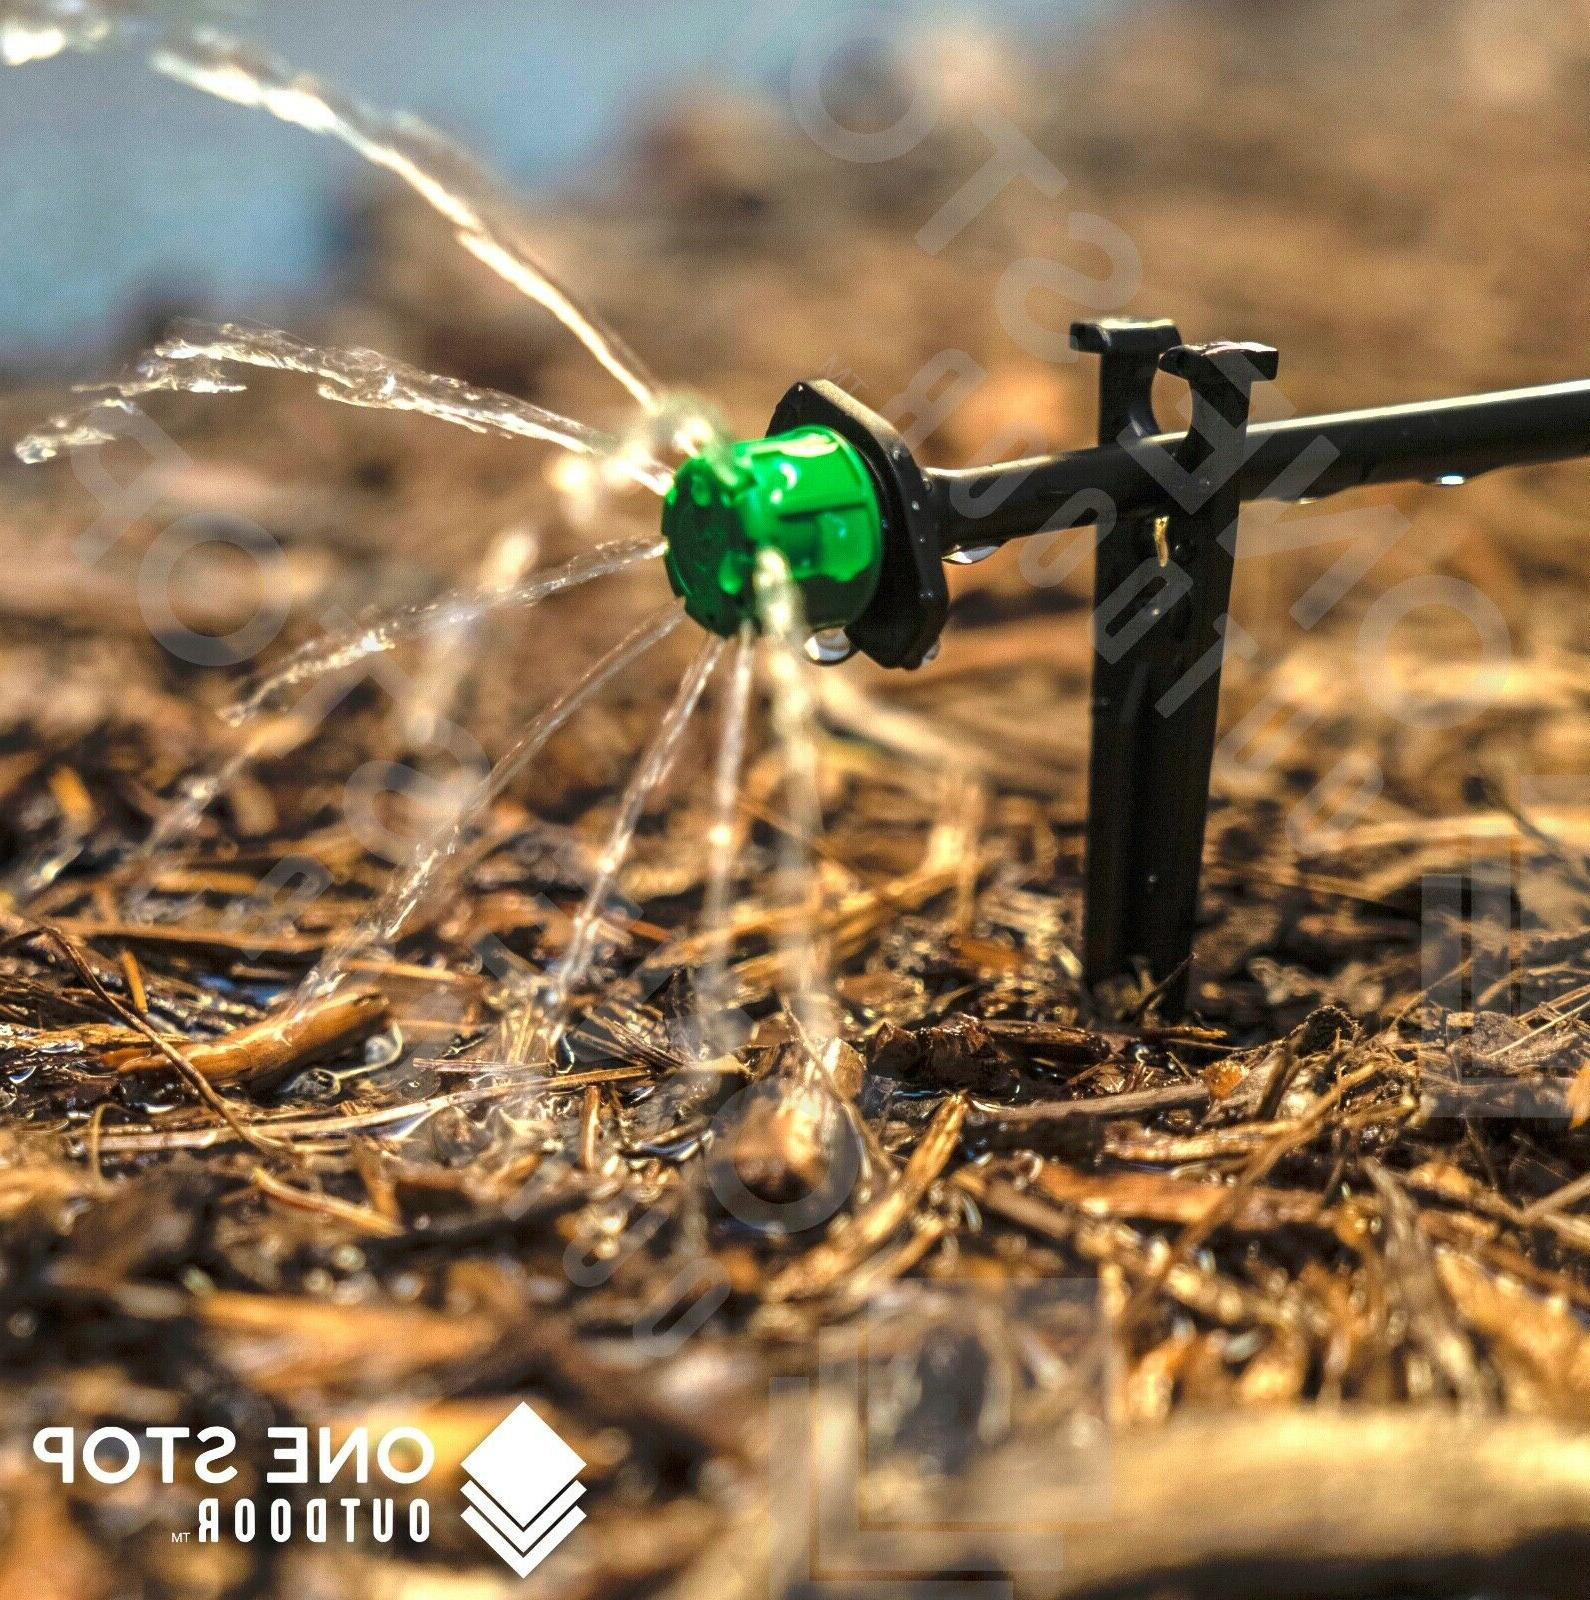 100Pc Micro Irrigation Sprinkler Watering System